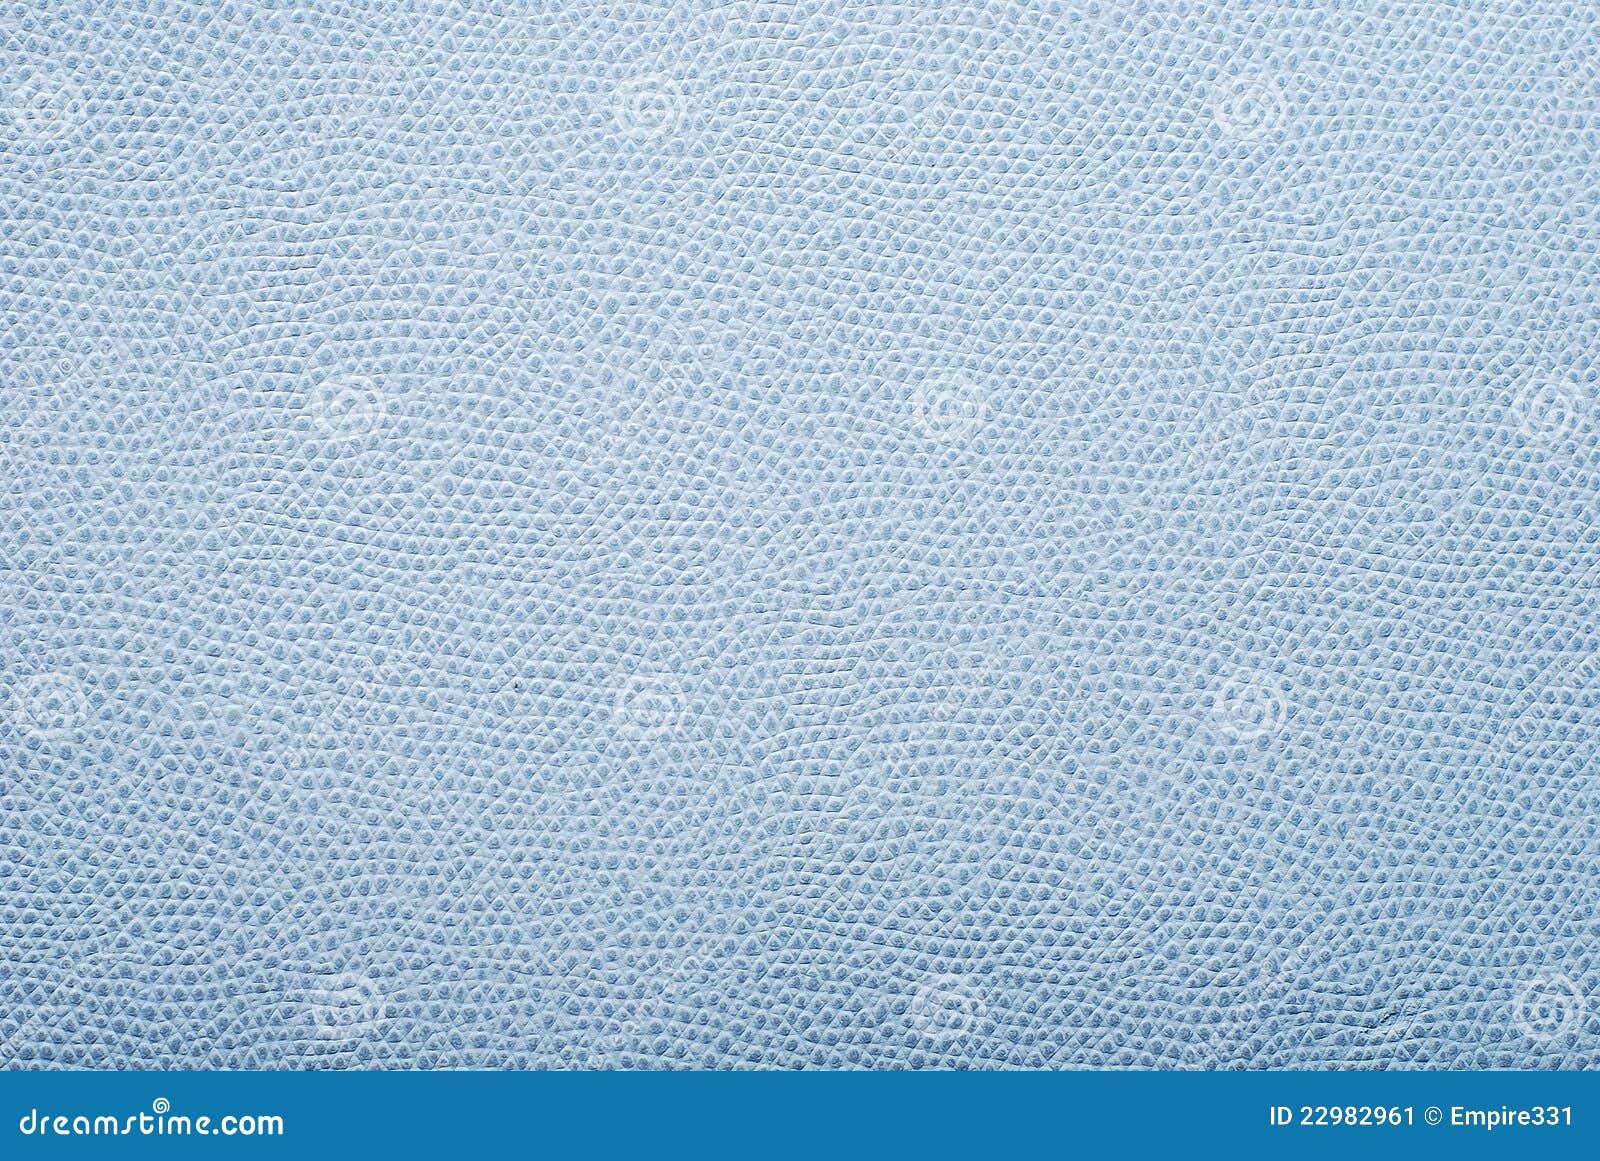 light blue leather background - photo #15